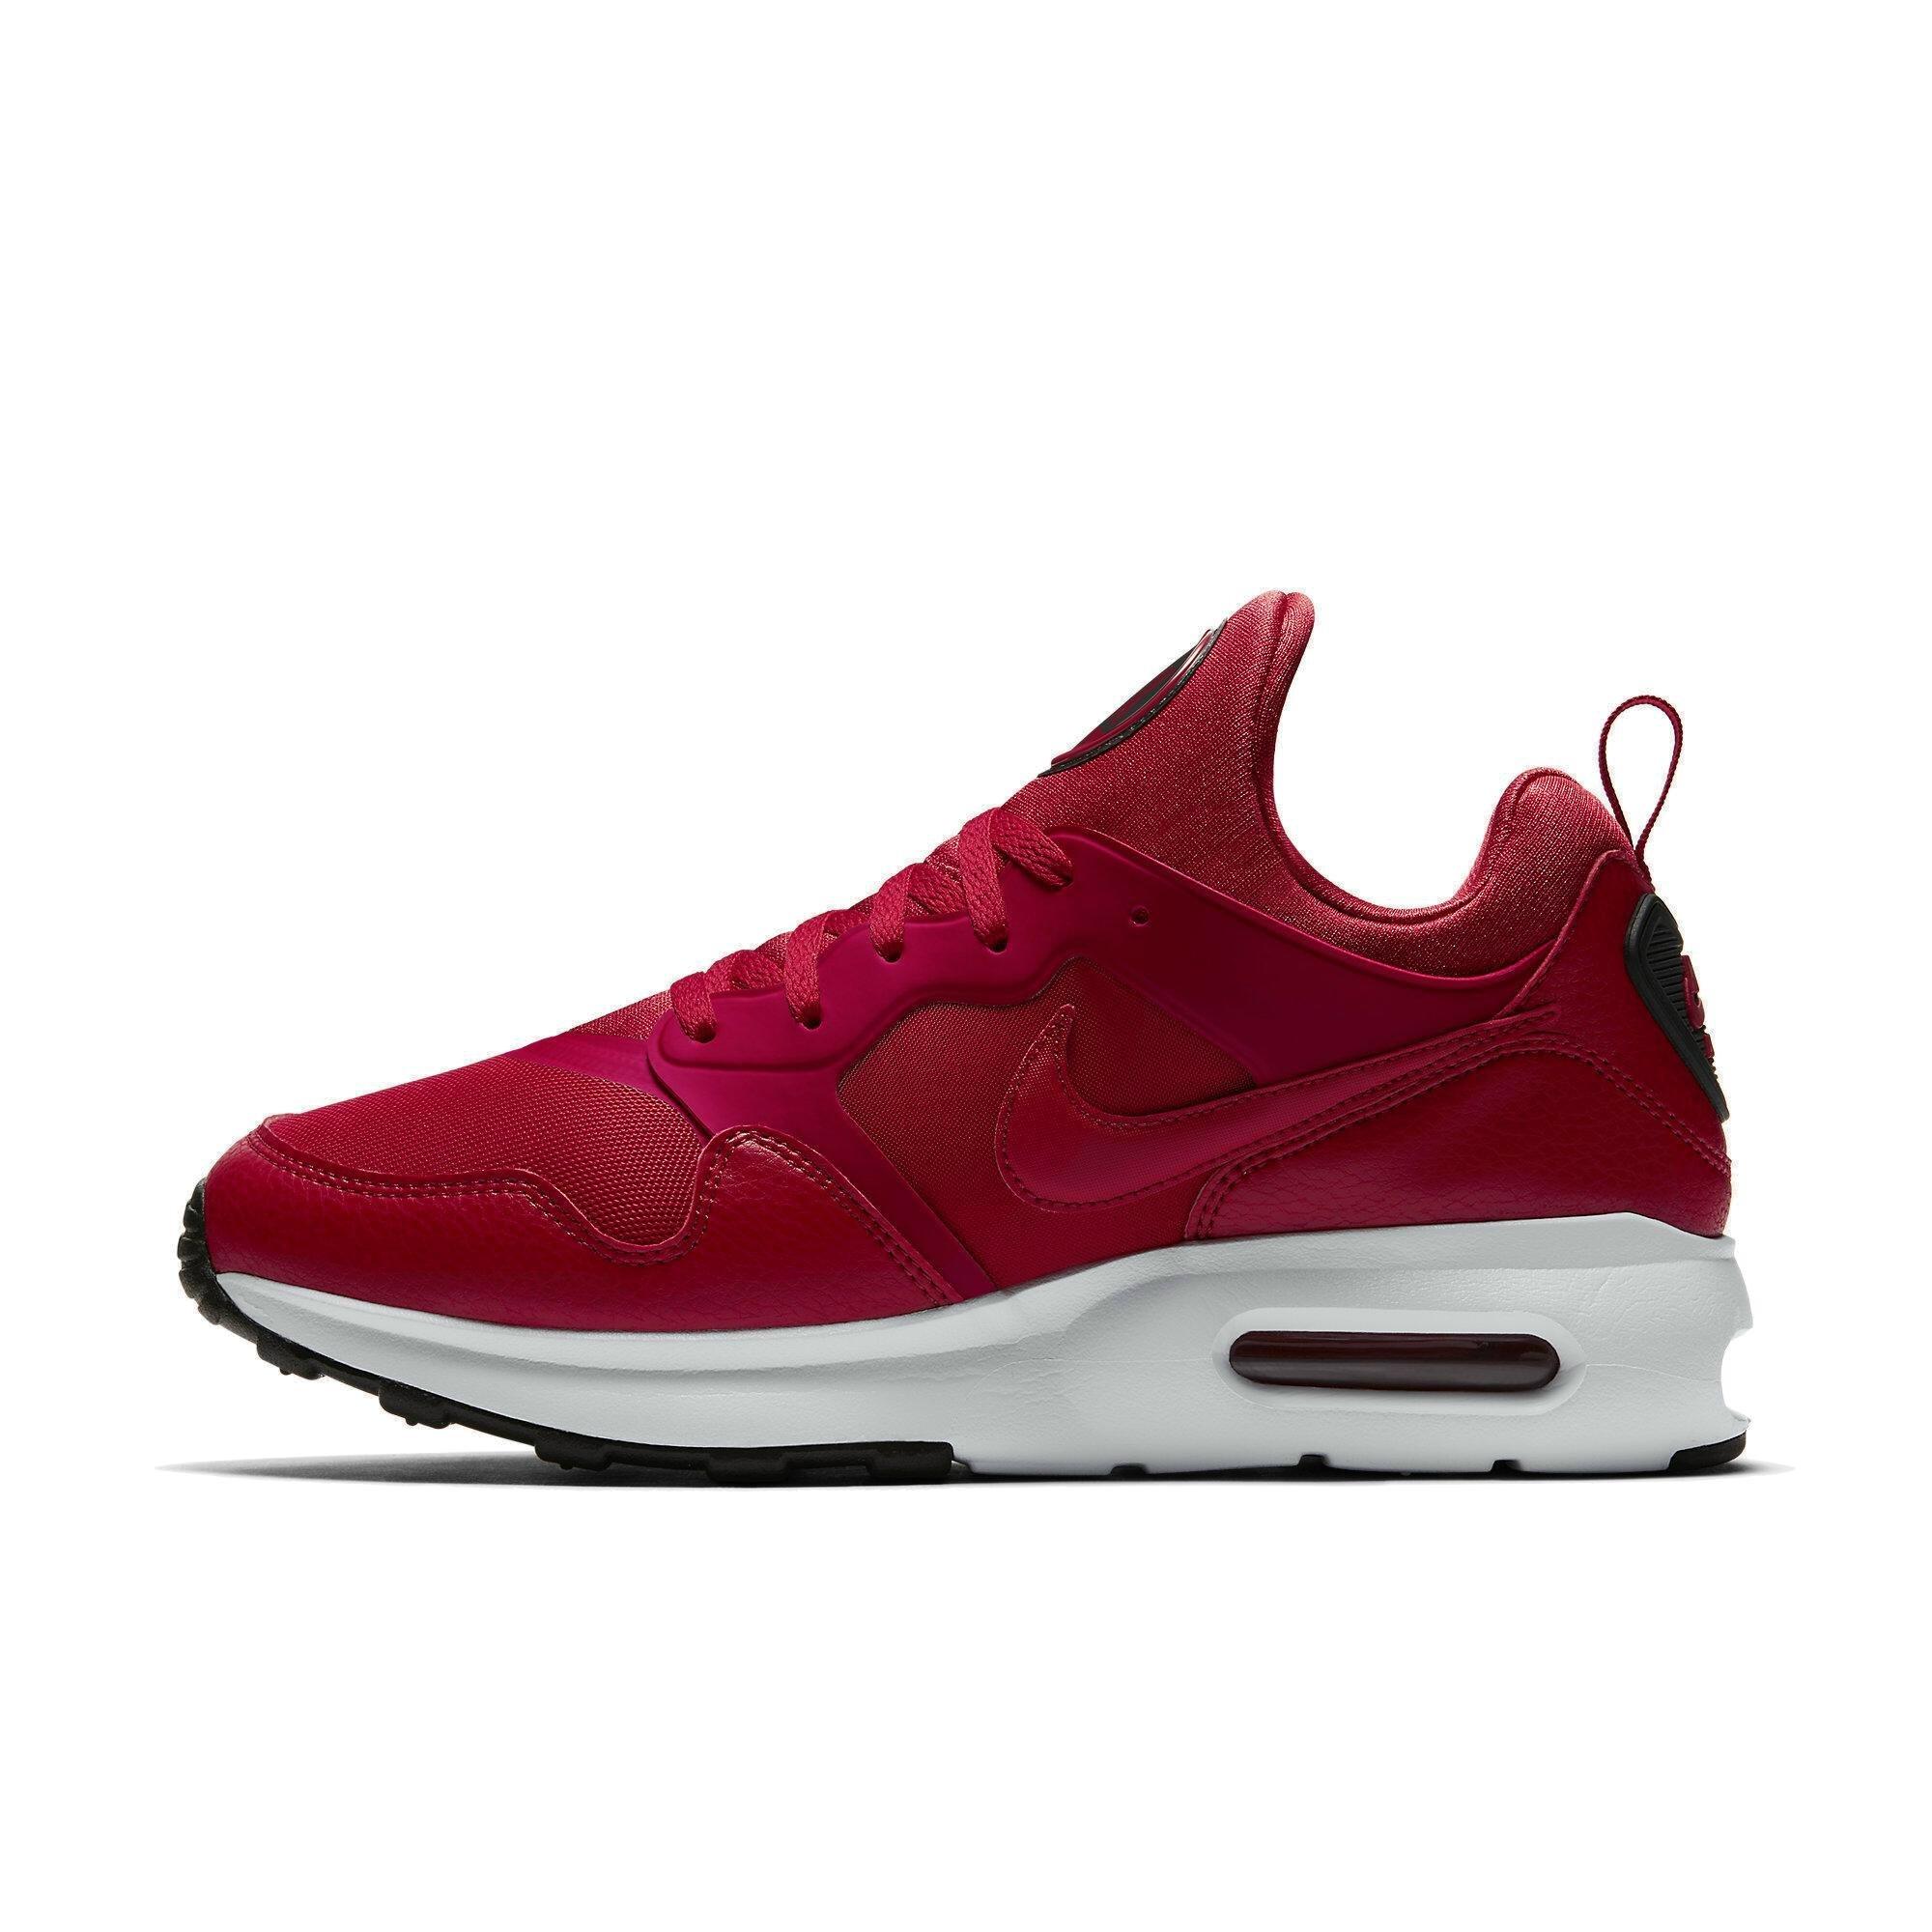 Nike Men's Air Max Prime Running Shoe 9 Red